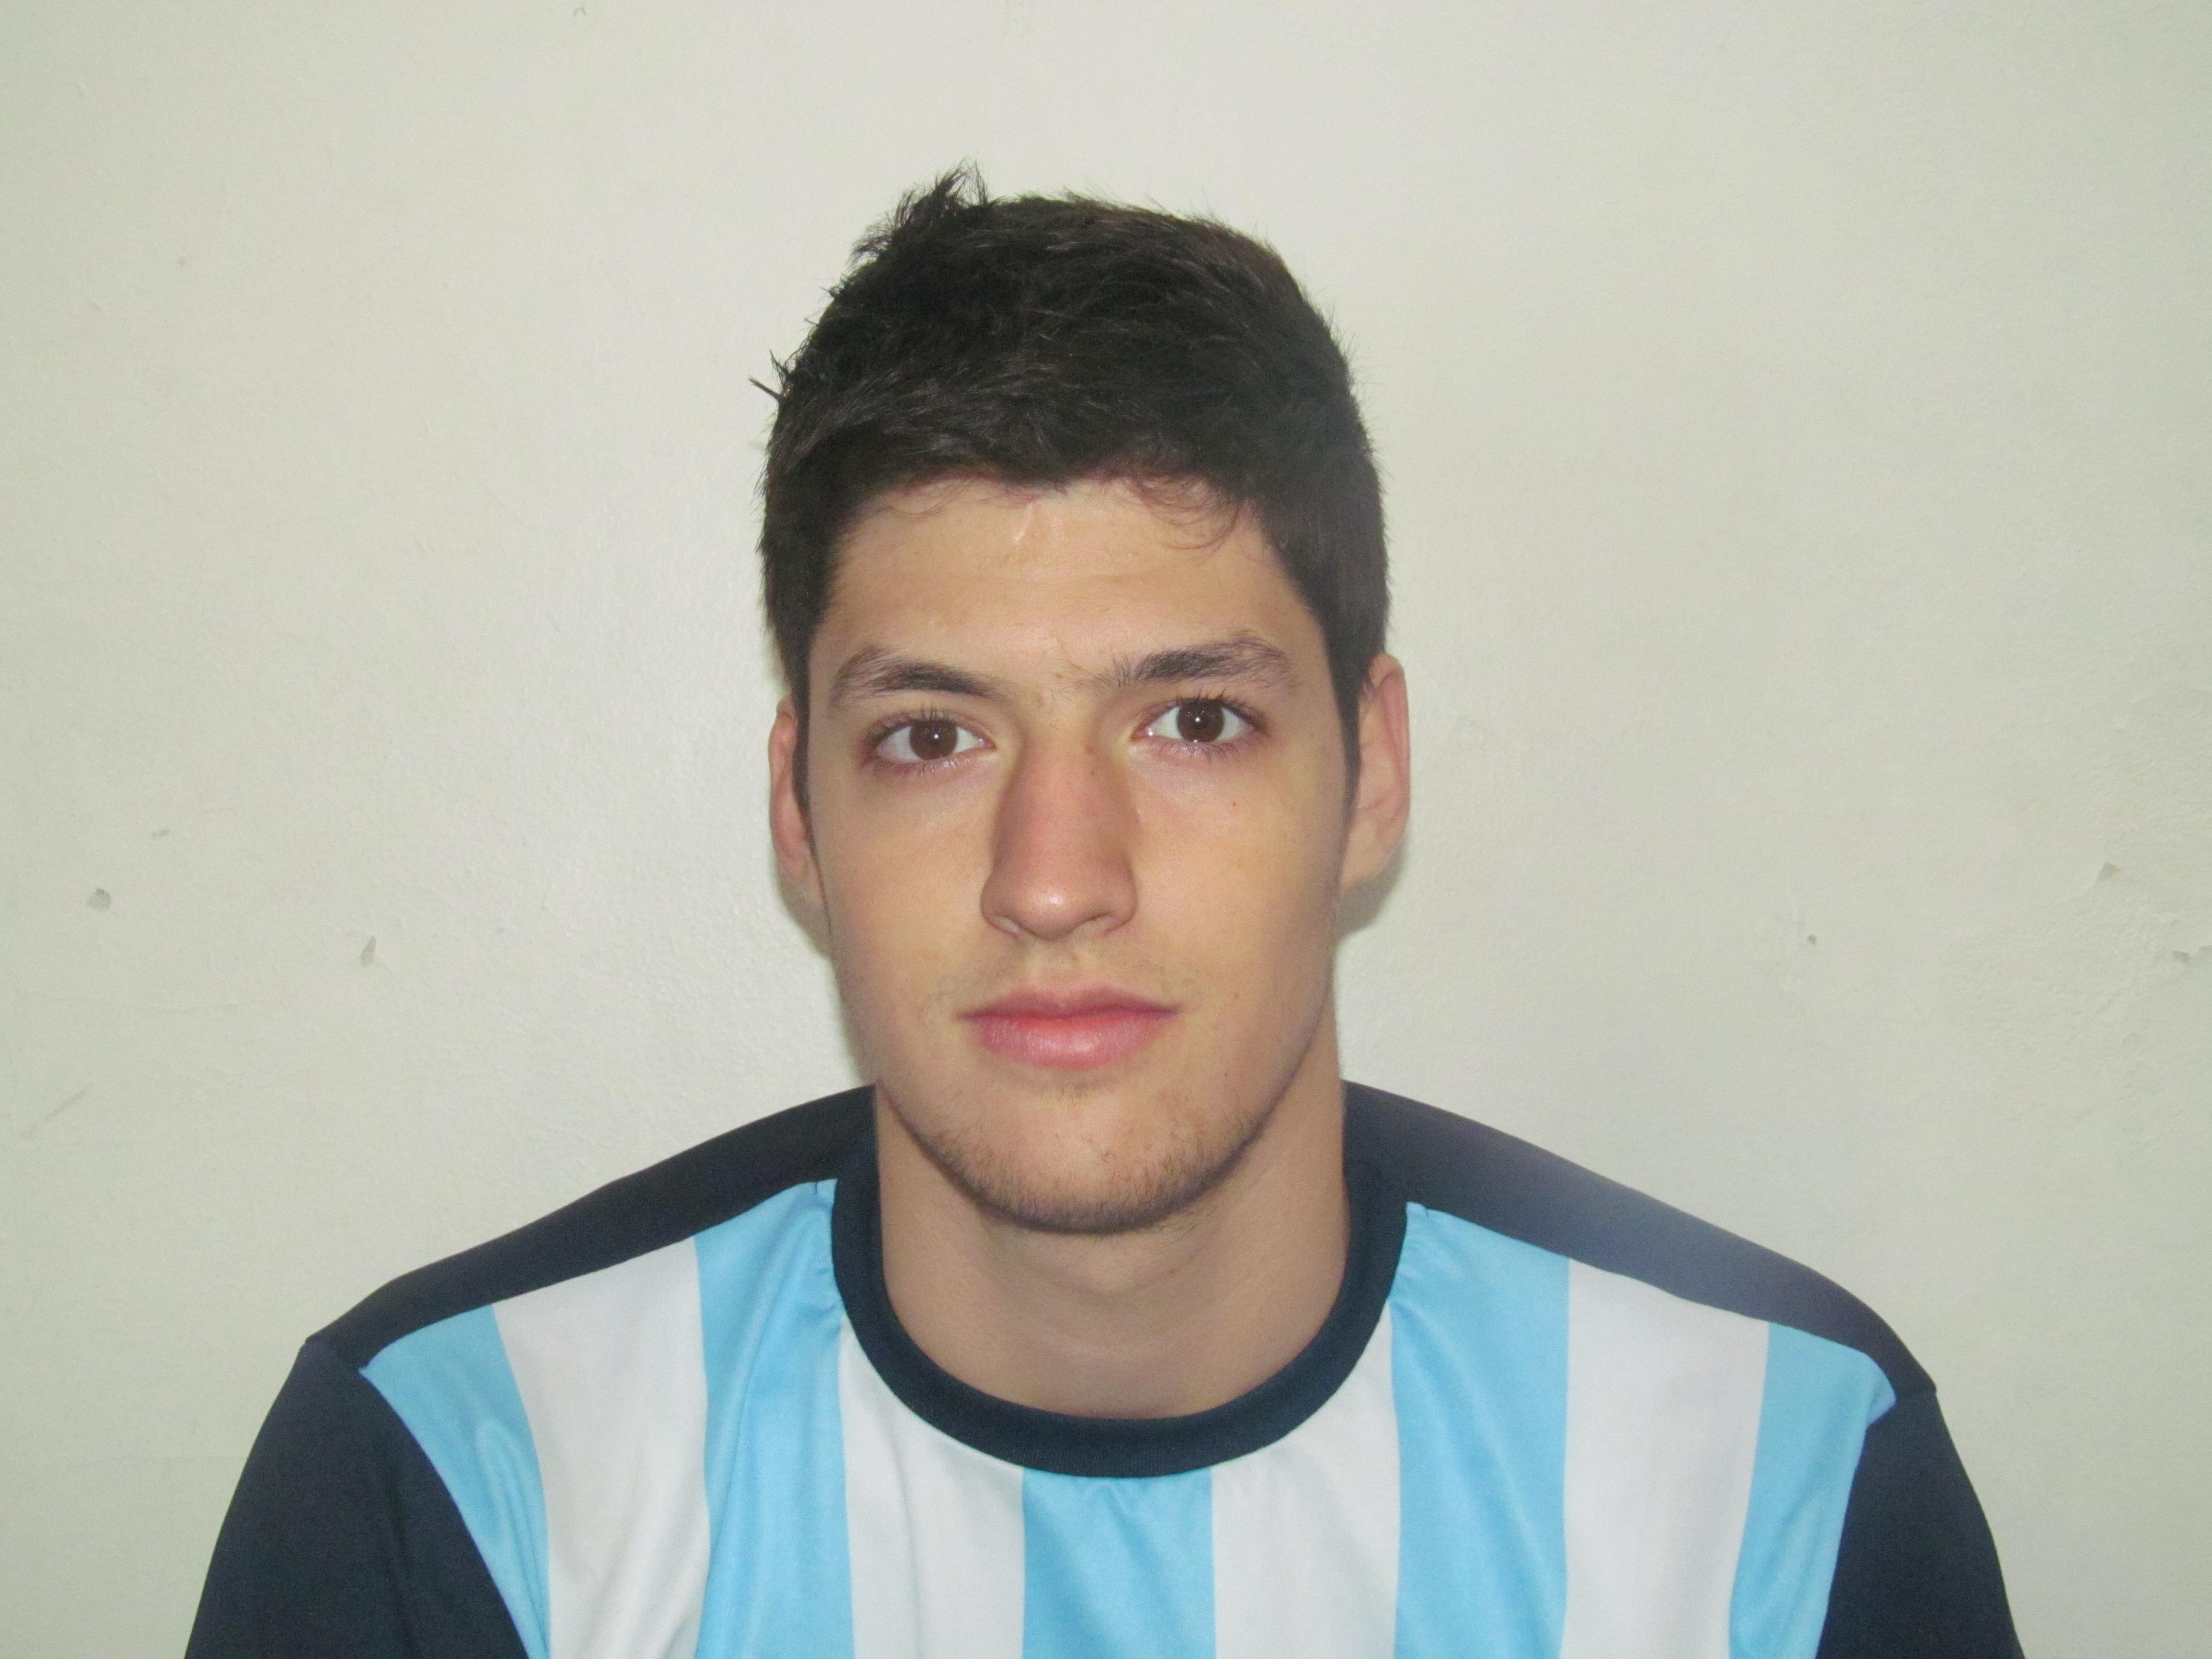 Joaquin Gallego